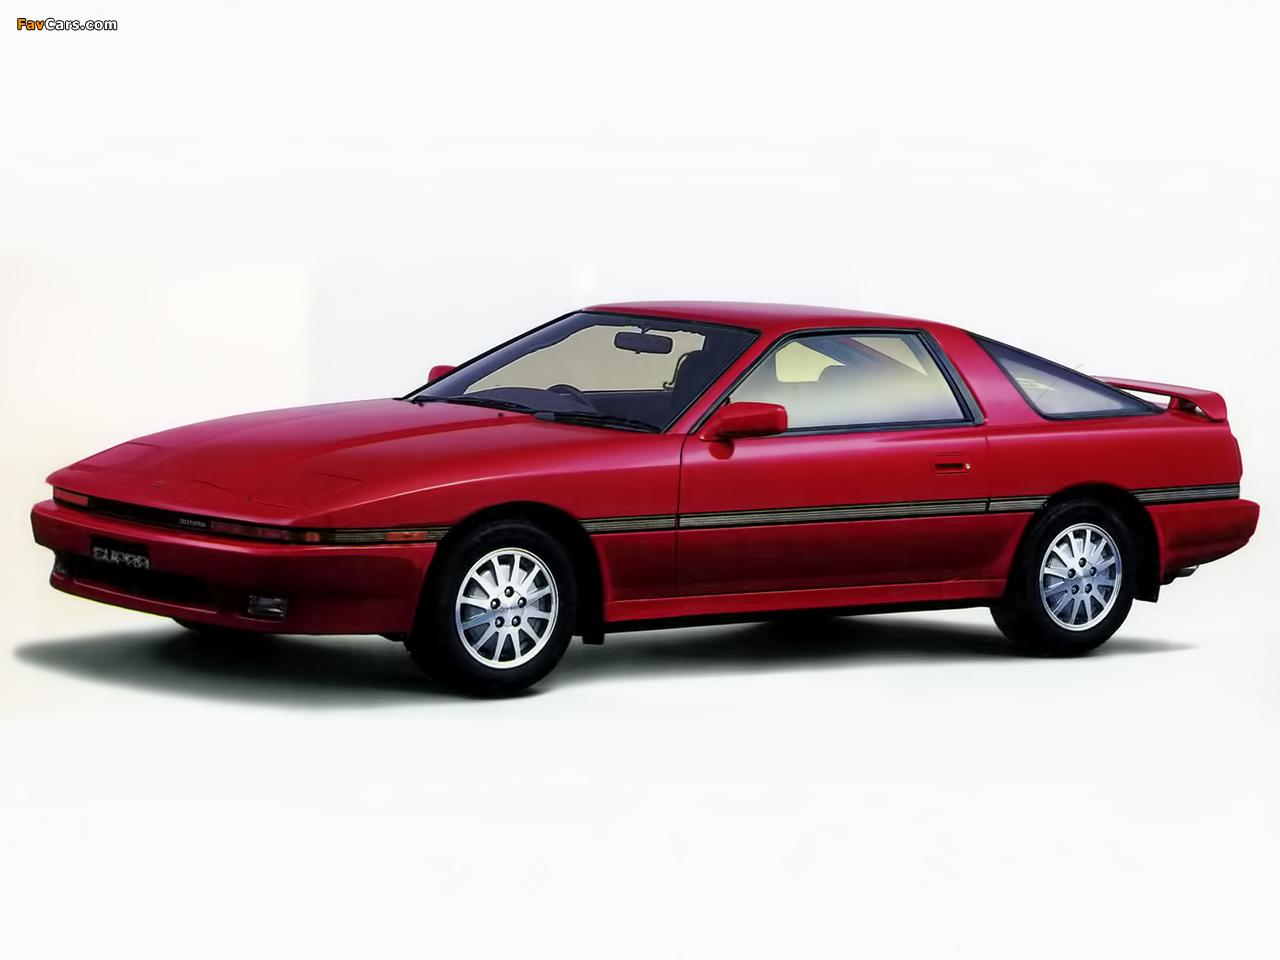 1986 Toyota Supra Turbo